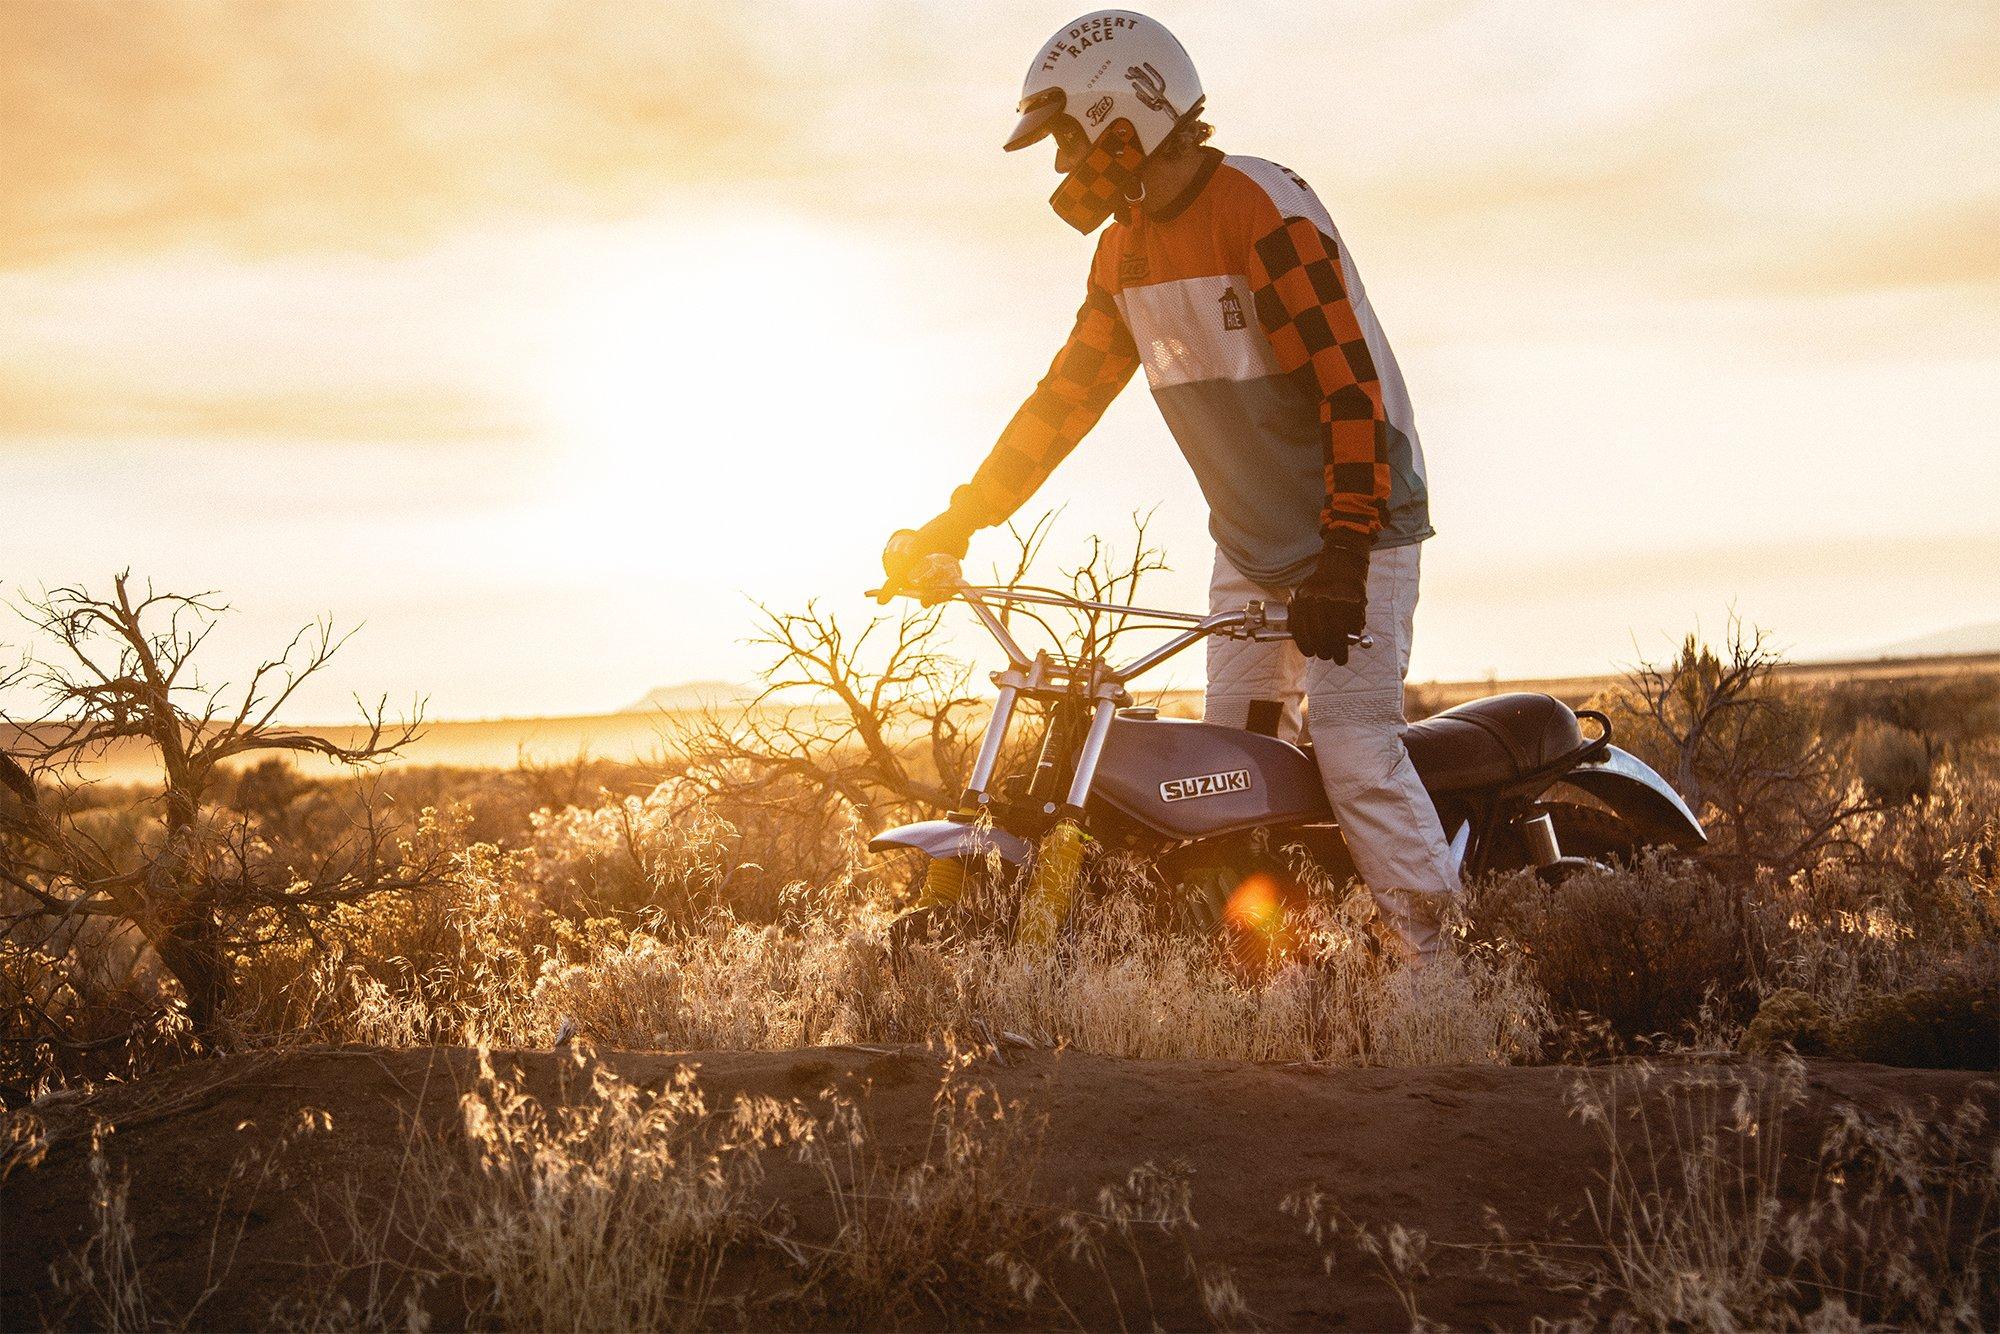 Fuel Desert Race